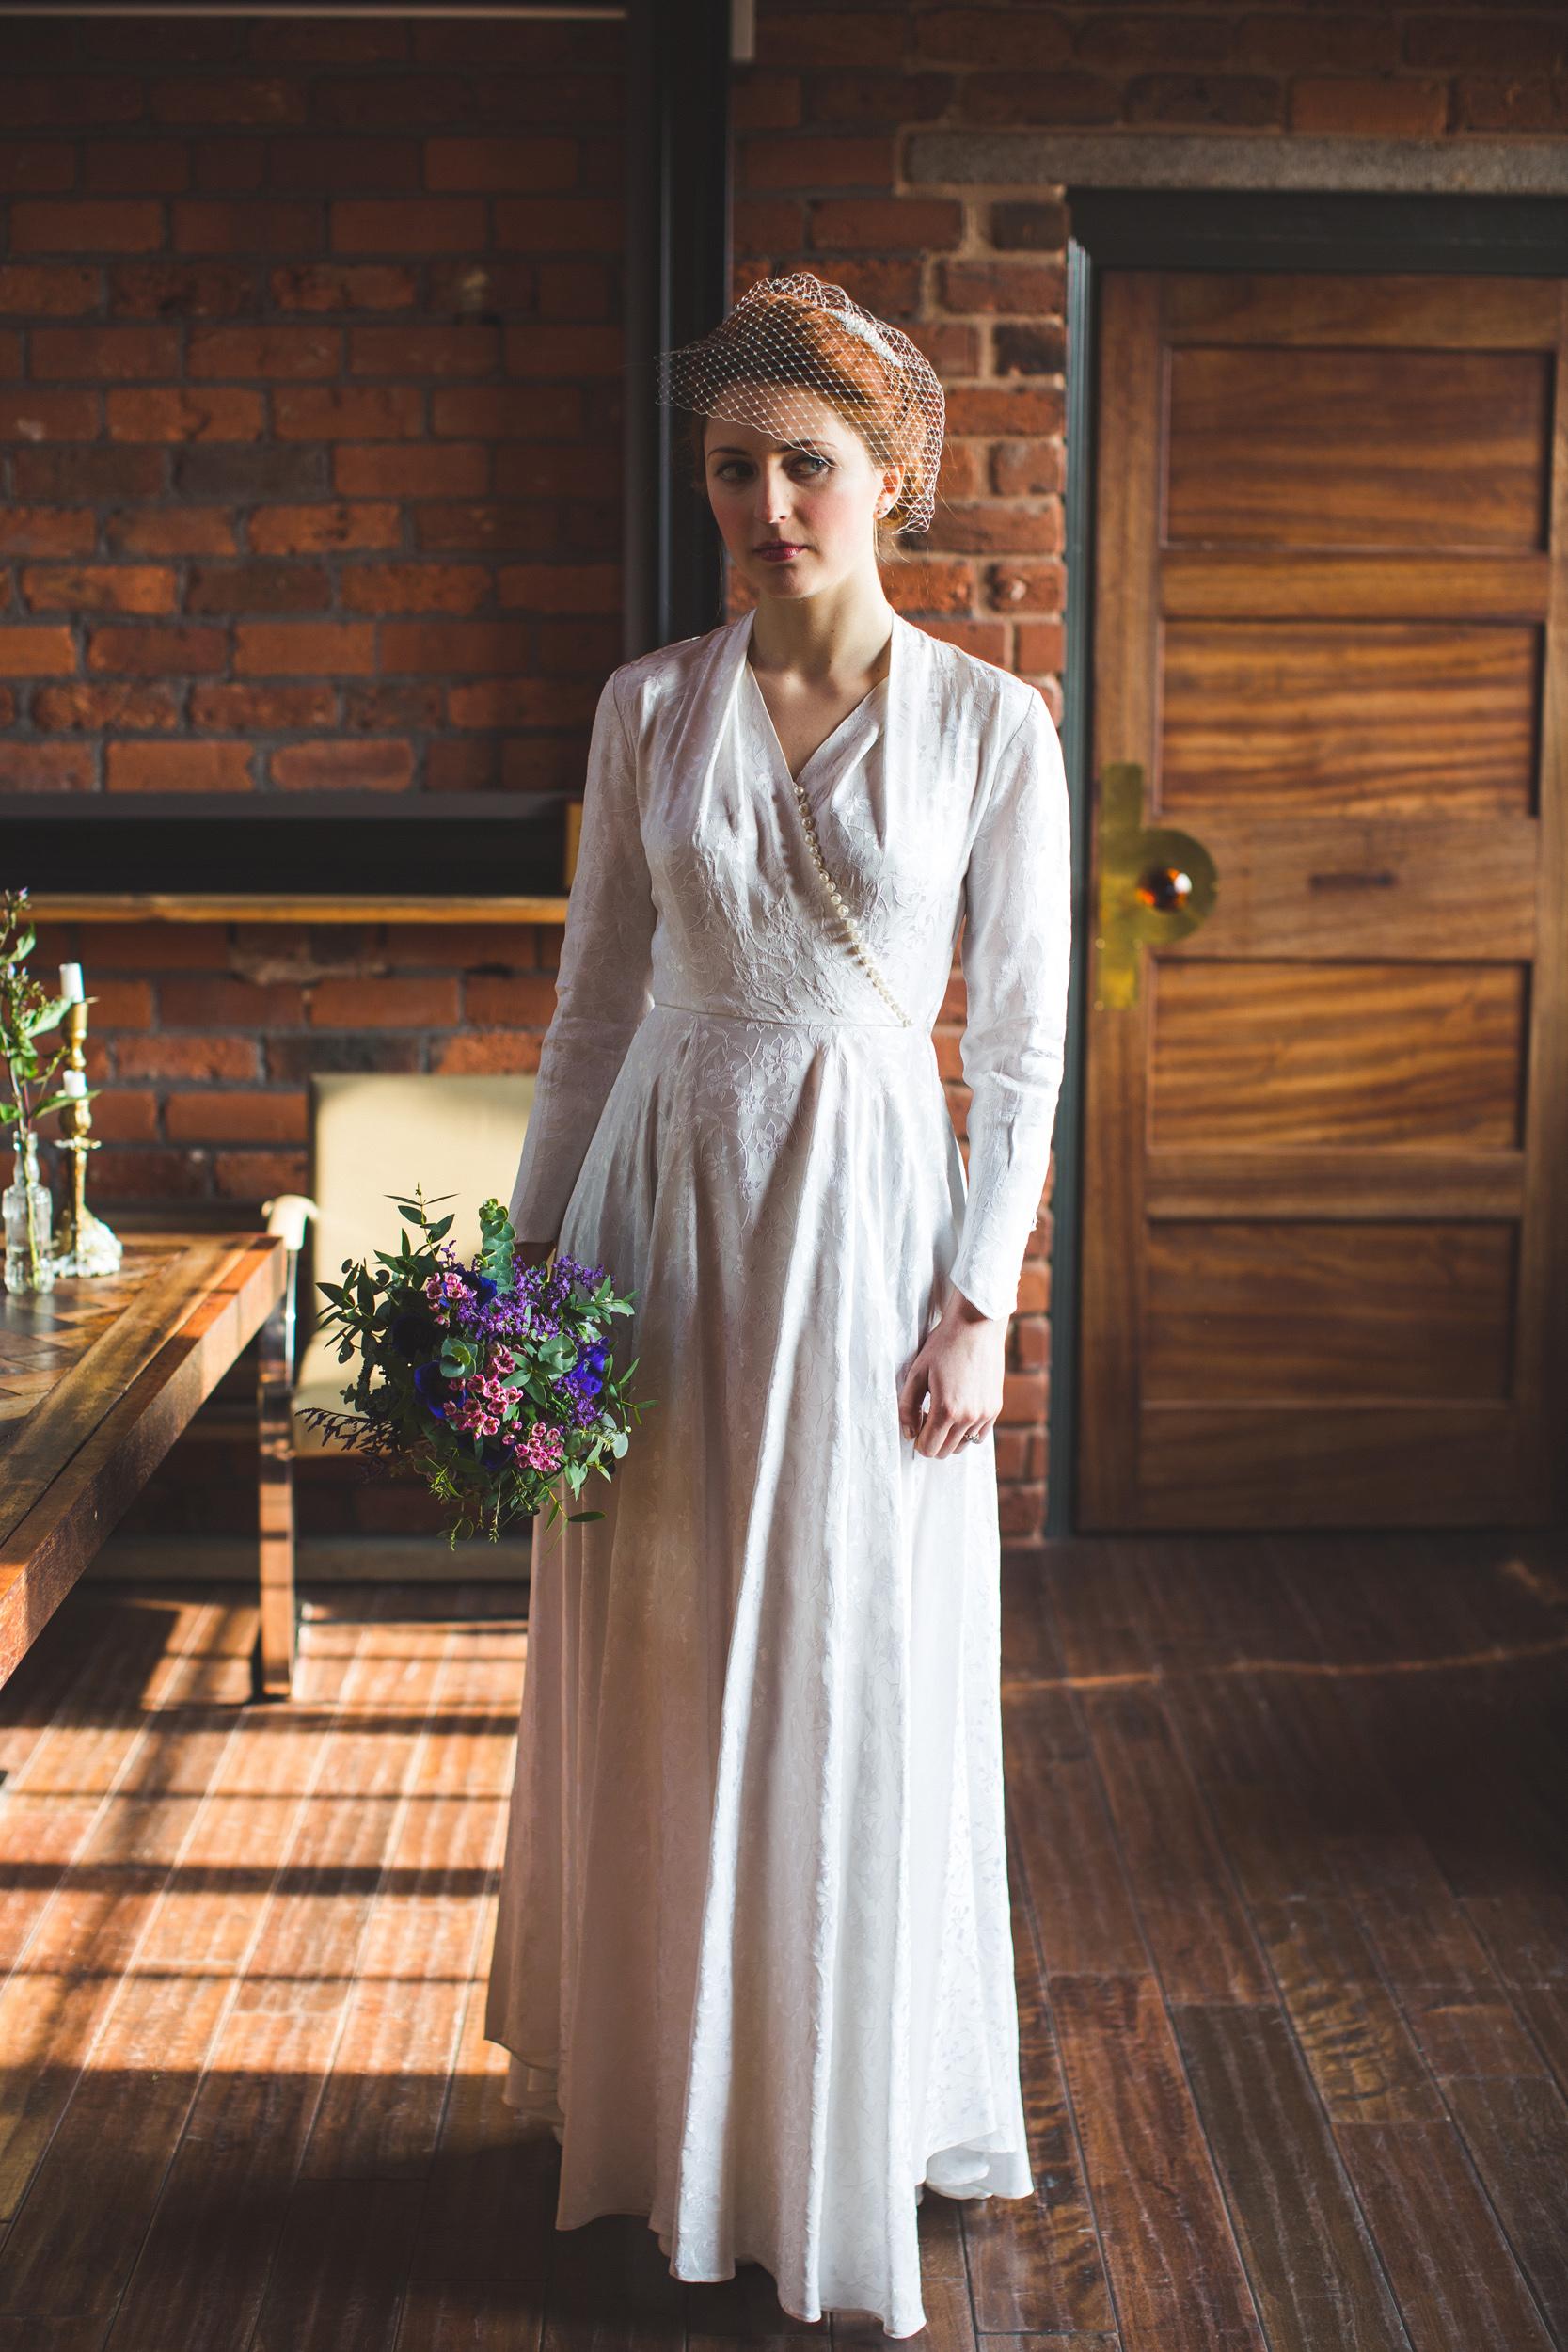 kate-beaumont-vintage-bridal-wedding-dresses-Sheffield-S6-16.jpg